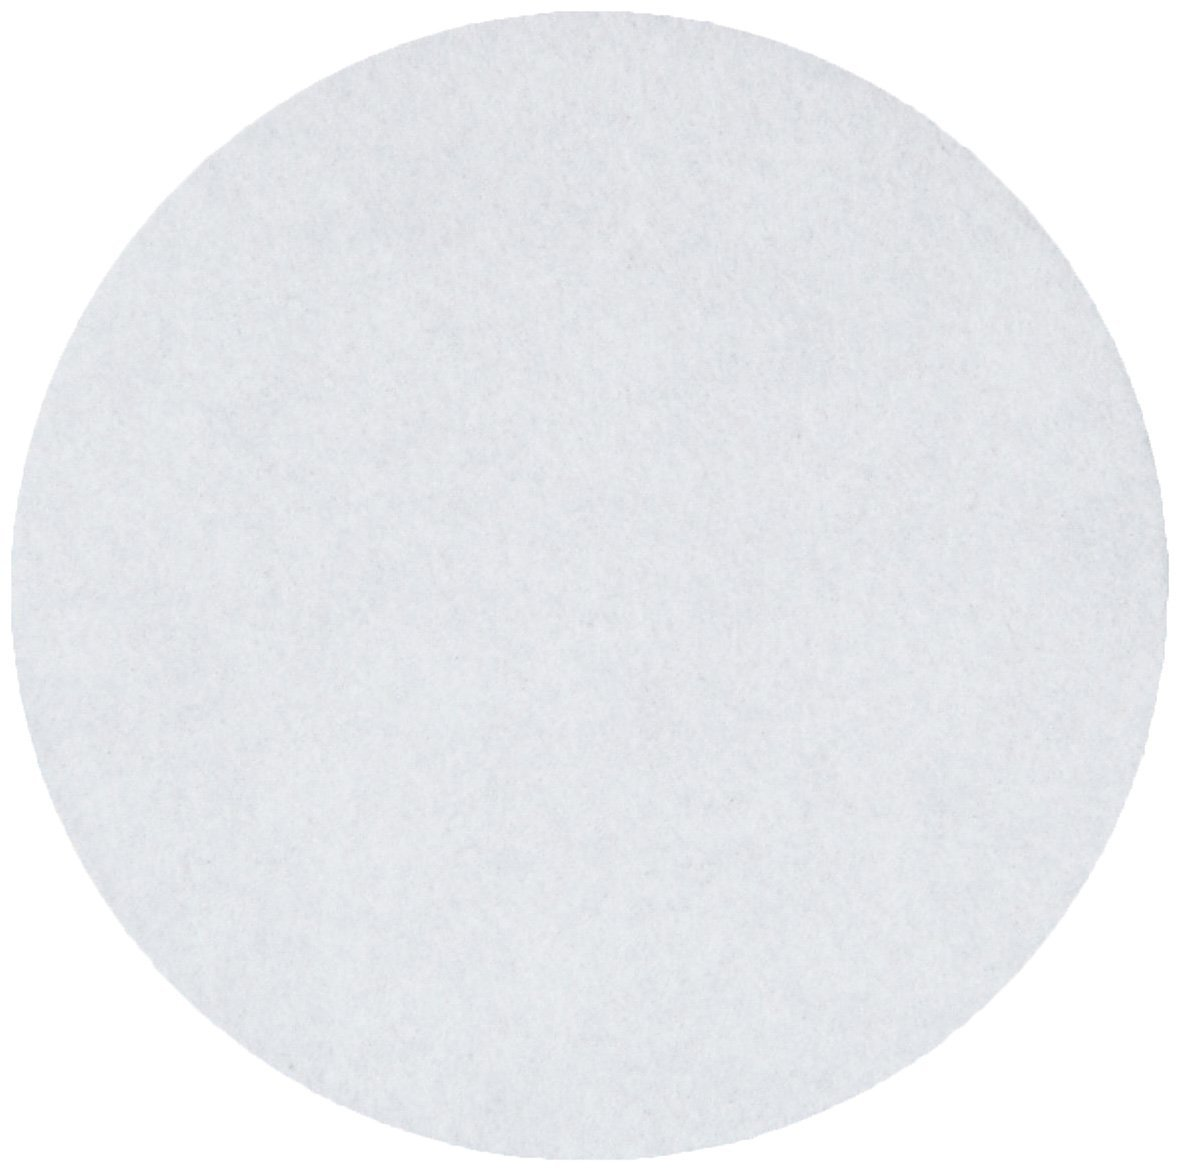 gift Whatman 10300106 Ashless Quantitative 50mm Filter shopping Paper Diamete